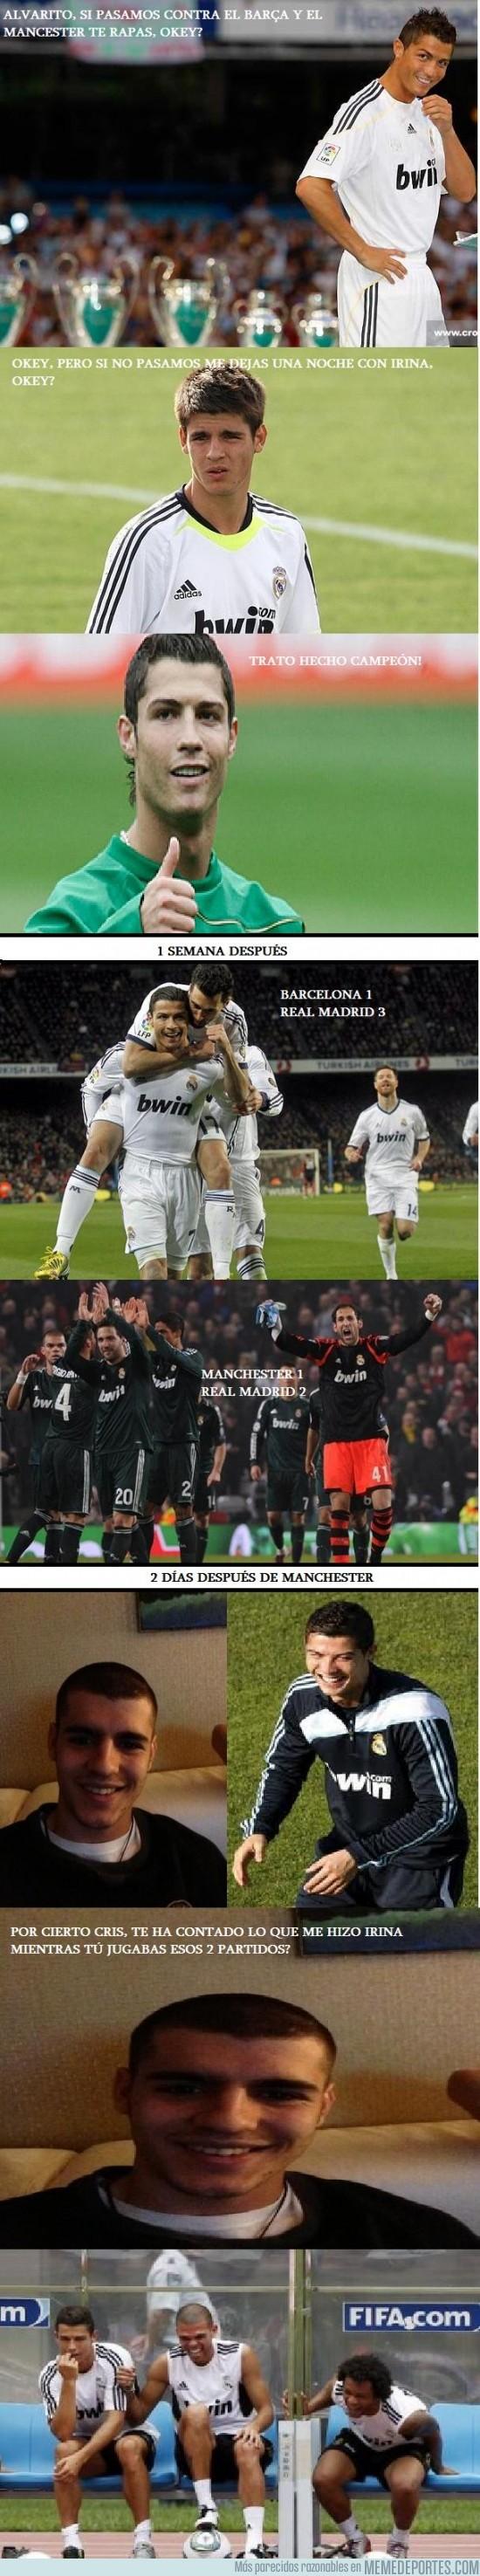 96577 - Álvaro Morata, el troll del Real Madrid